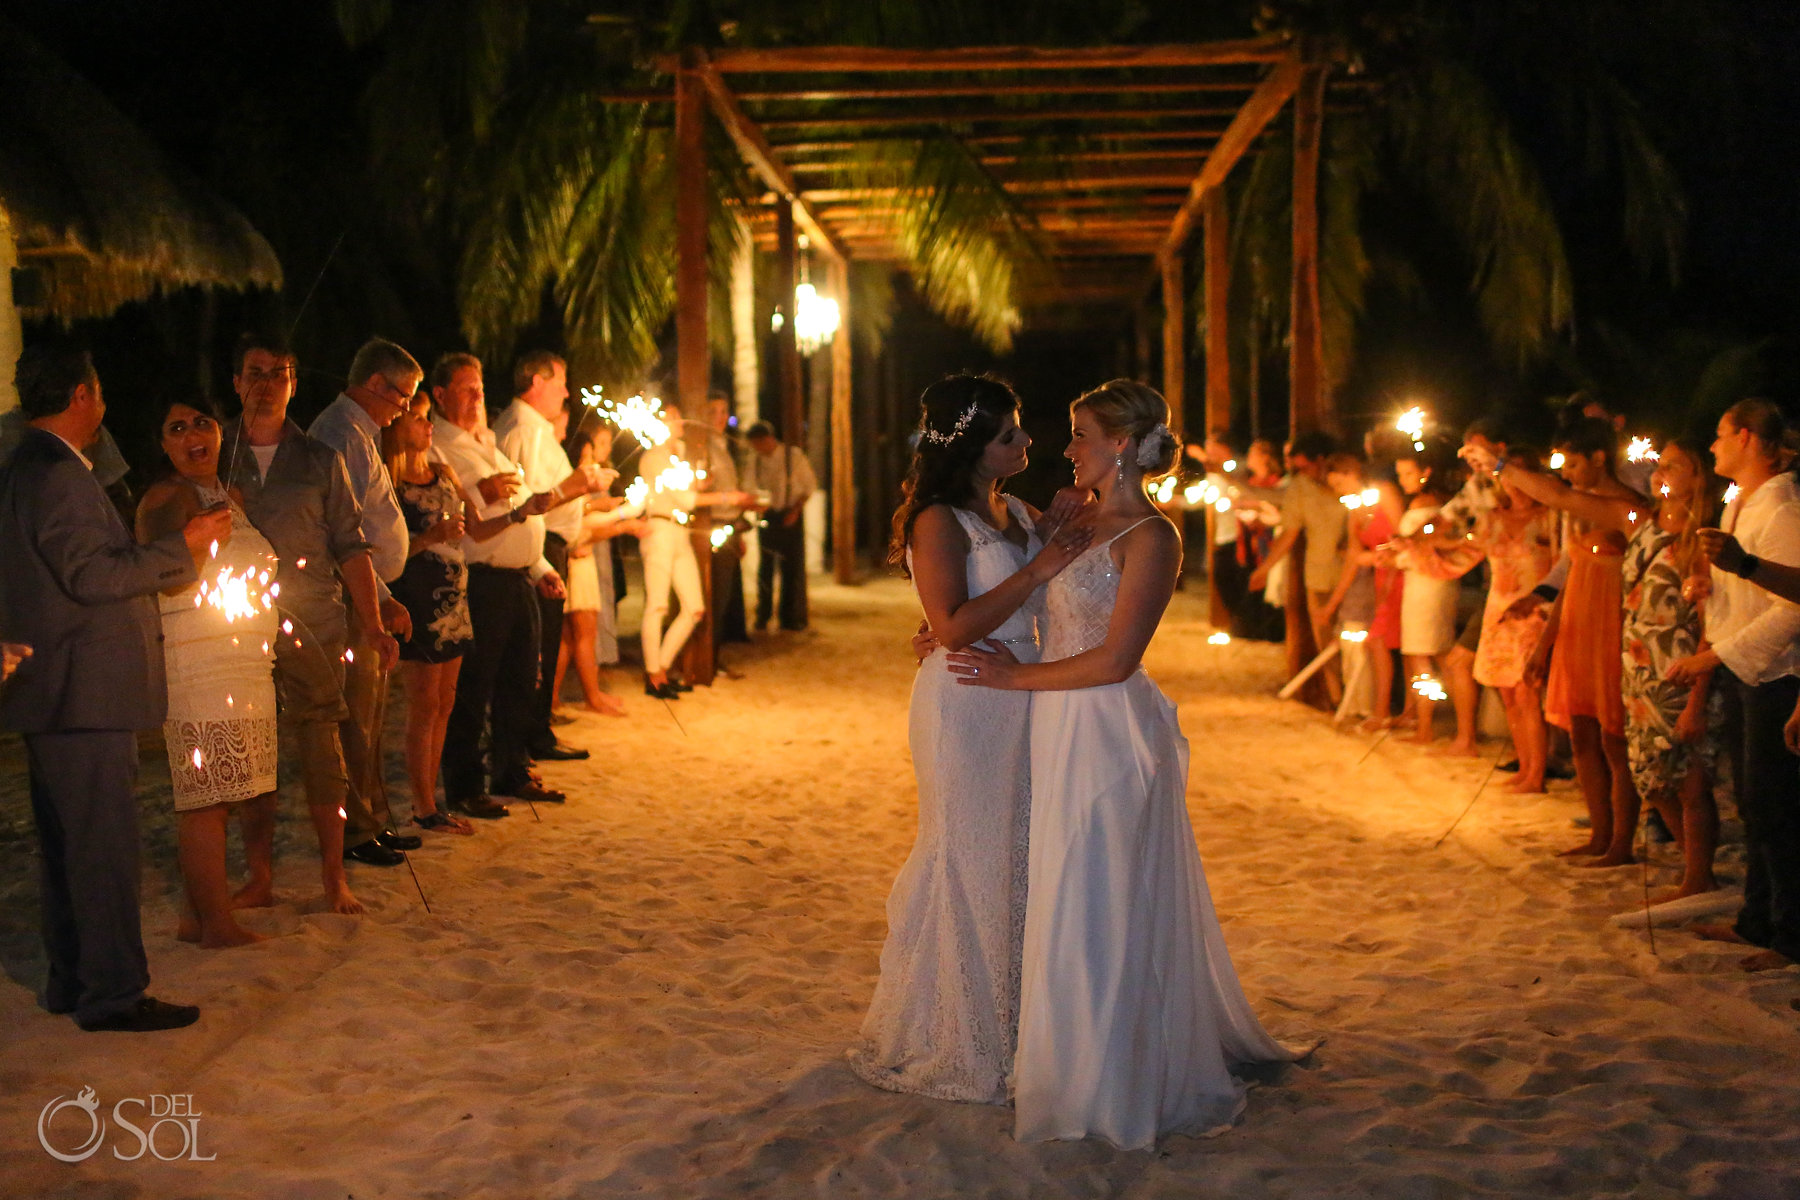 LGBT Wedding Sparklers lesbian brides in love